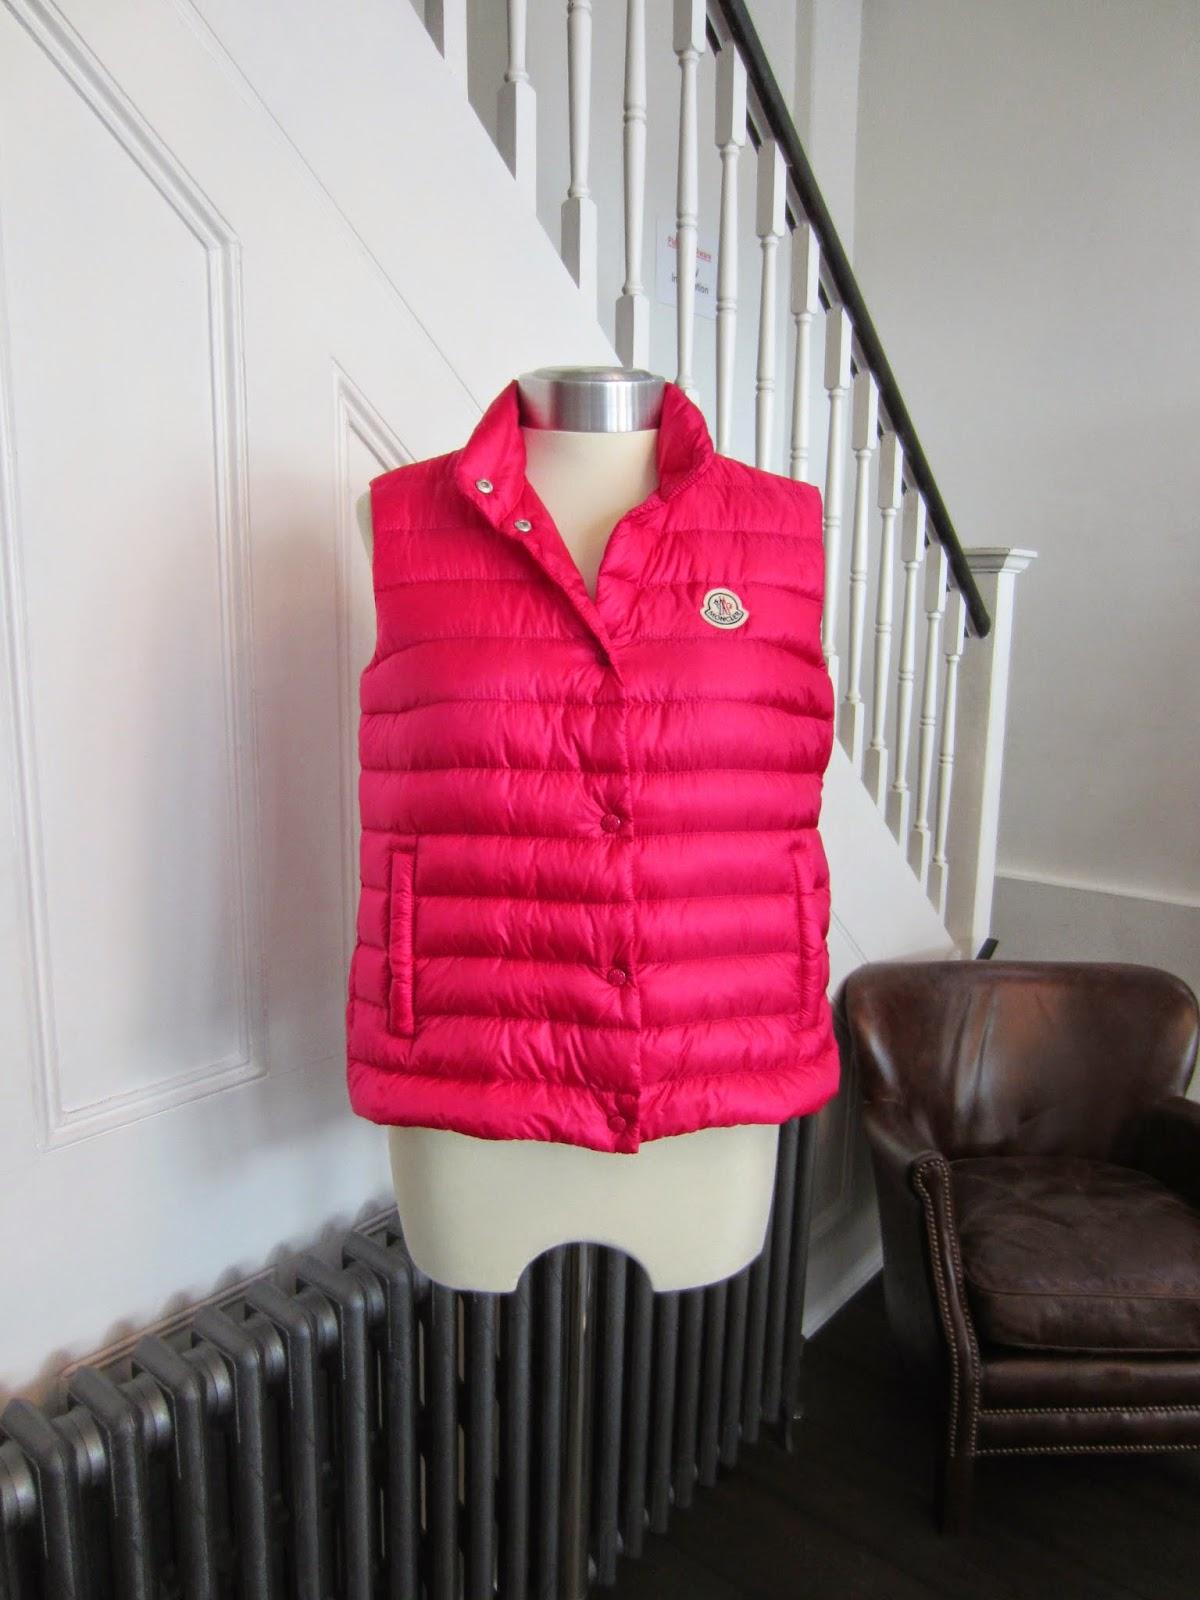 Moncler Pink 'Yui' Gilet/Vest